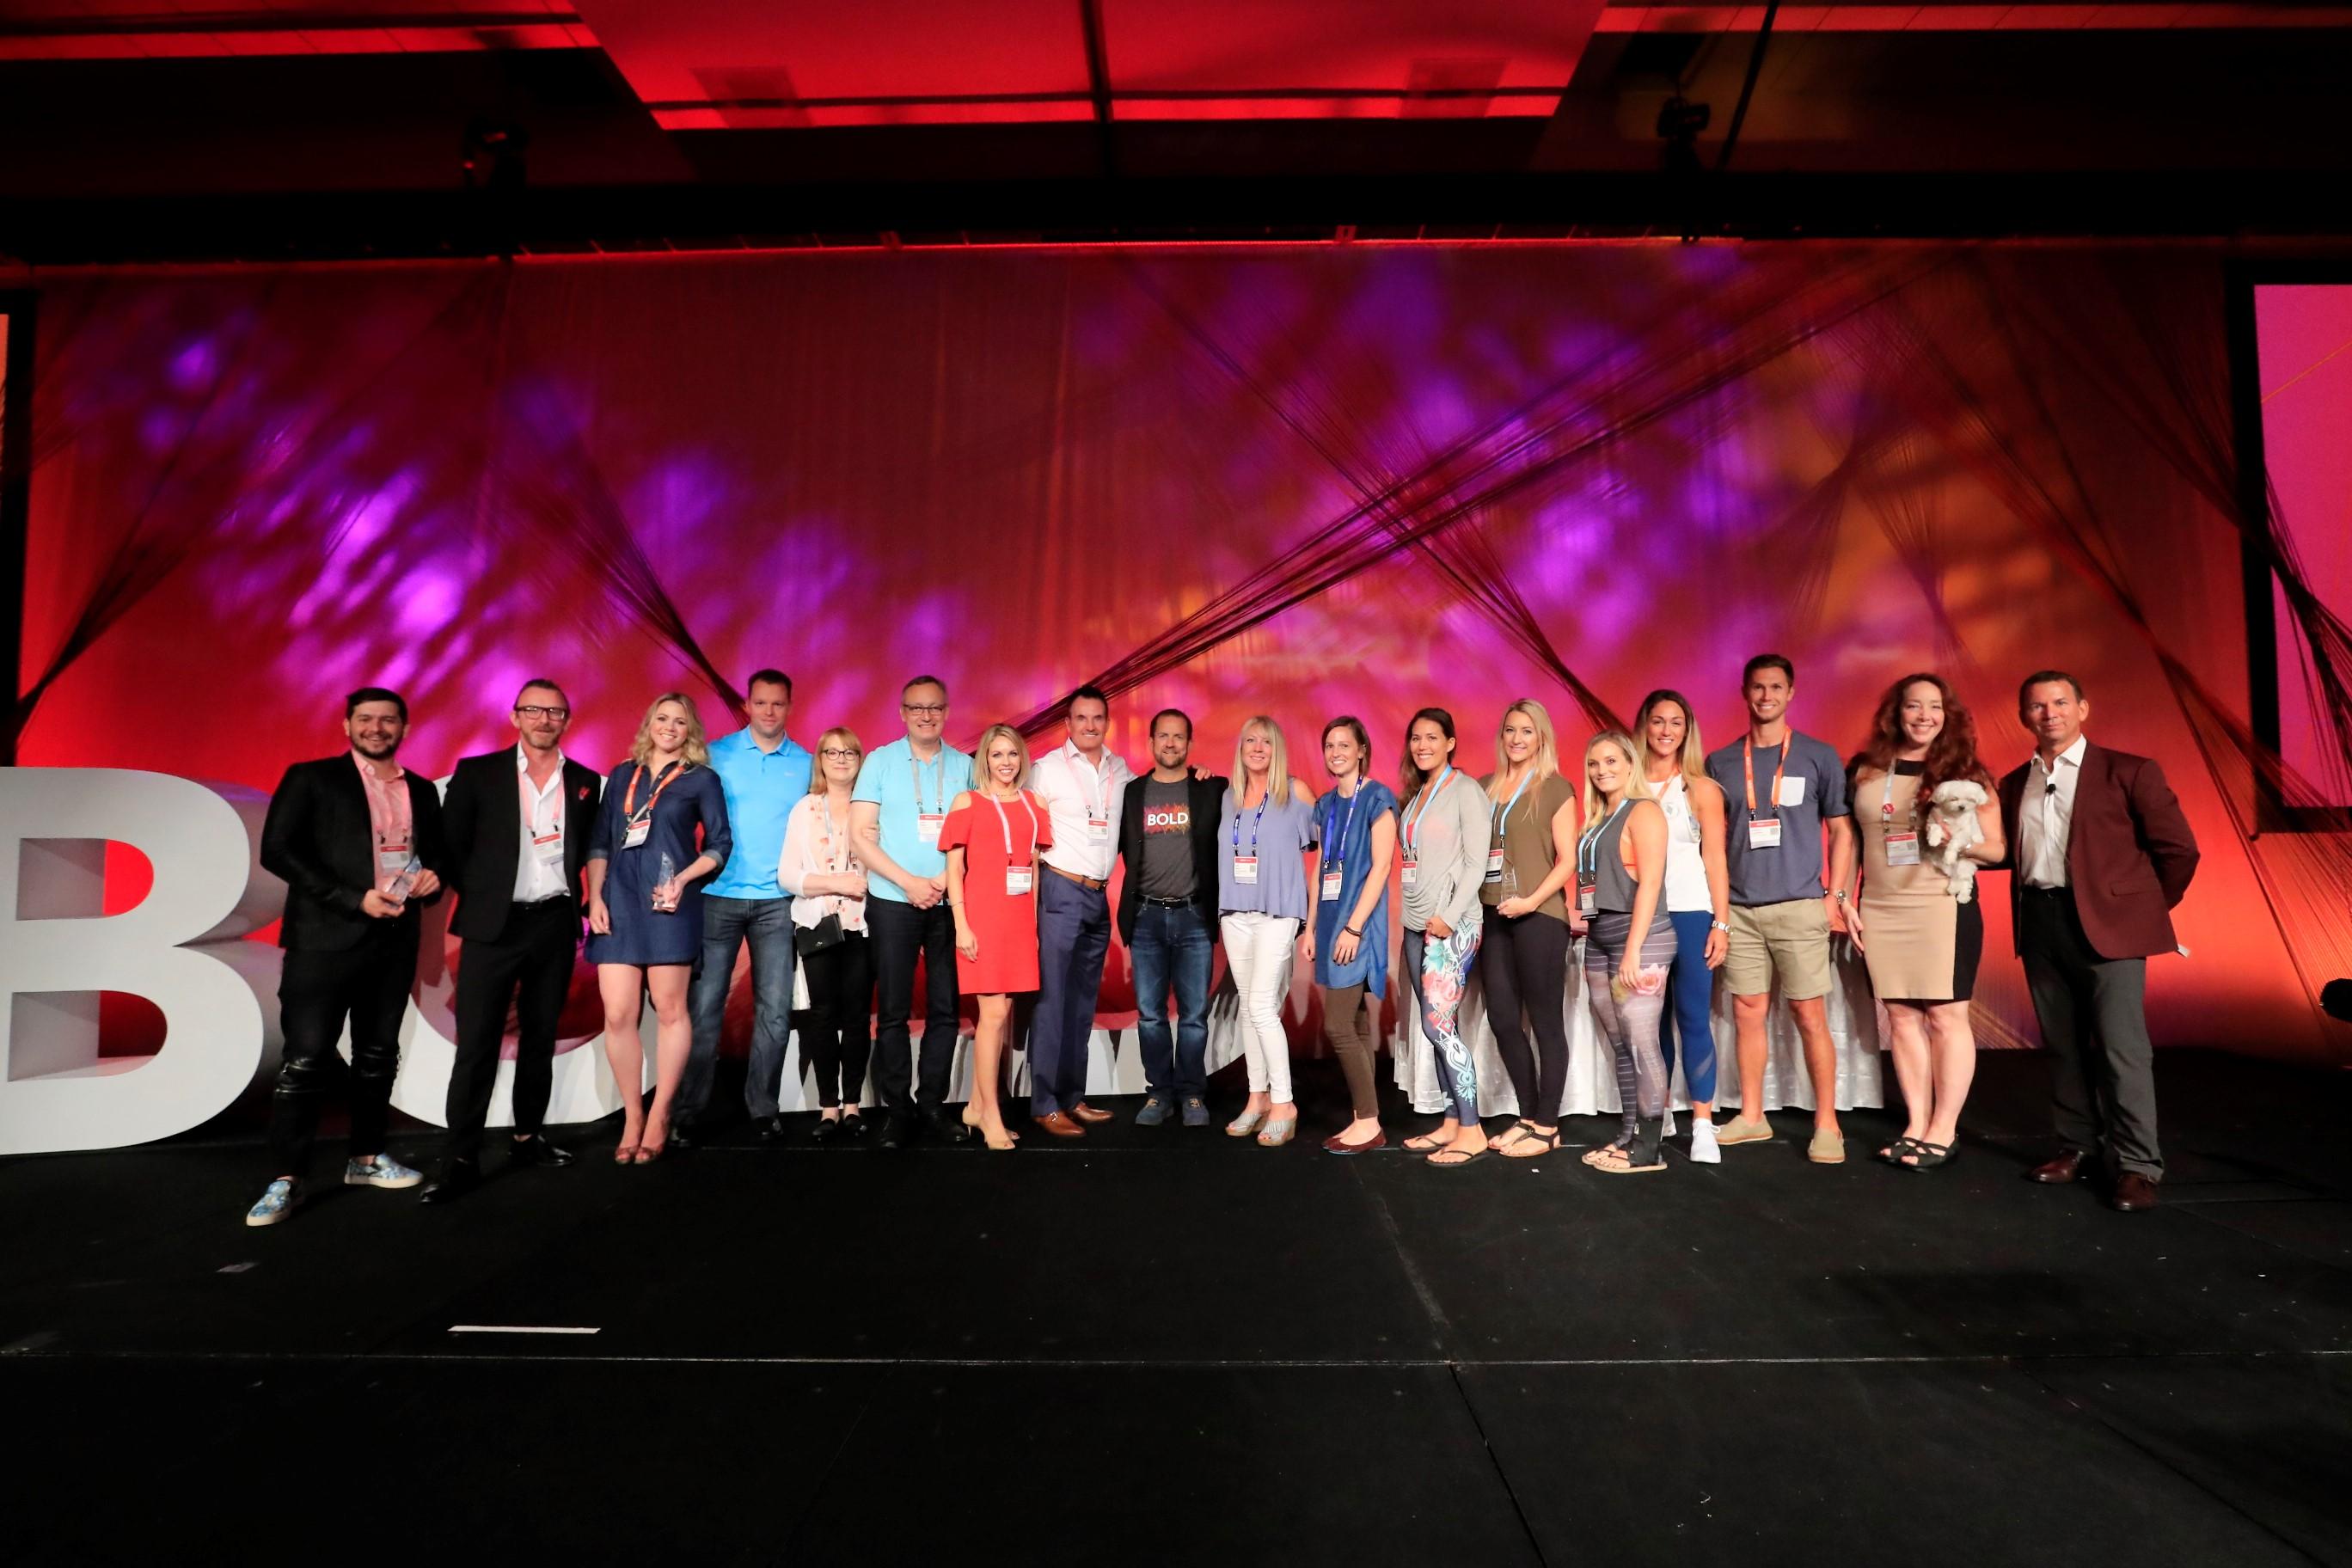 2017 MINDBODY BOLD Awards Winners Announced